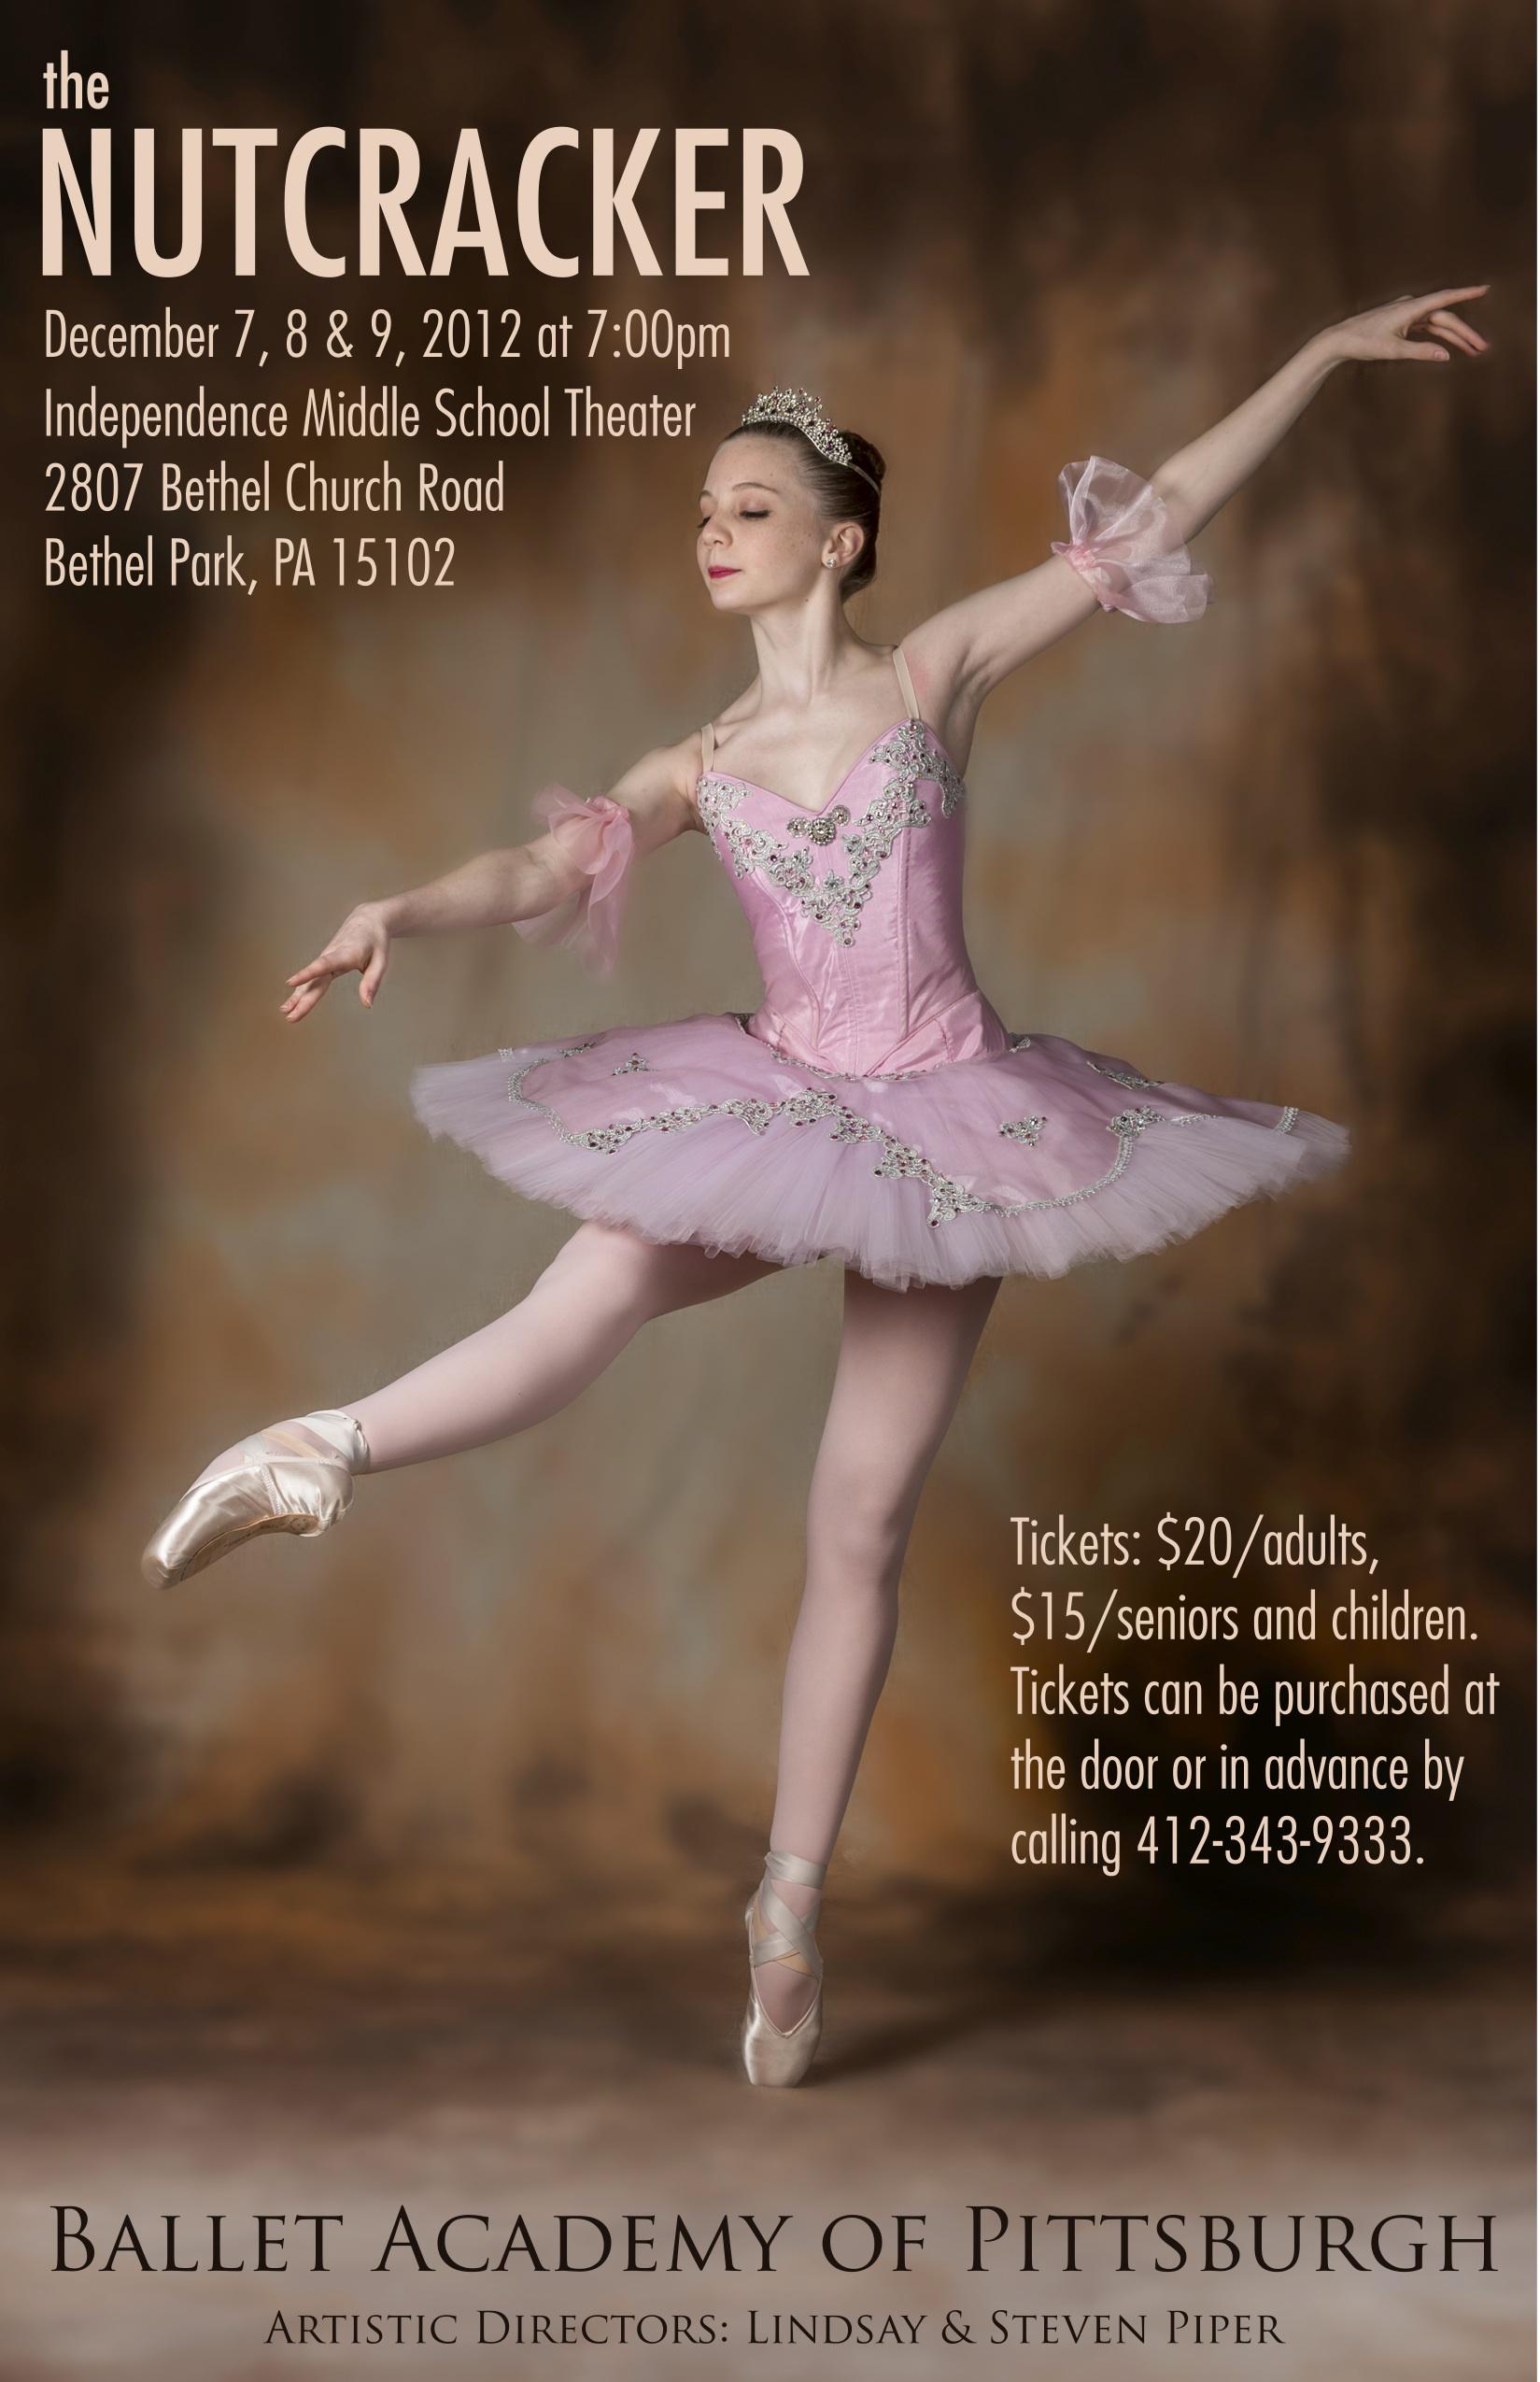 Displaying 18> Images For - Nutcracker Ballet Poster...